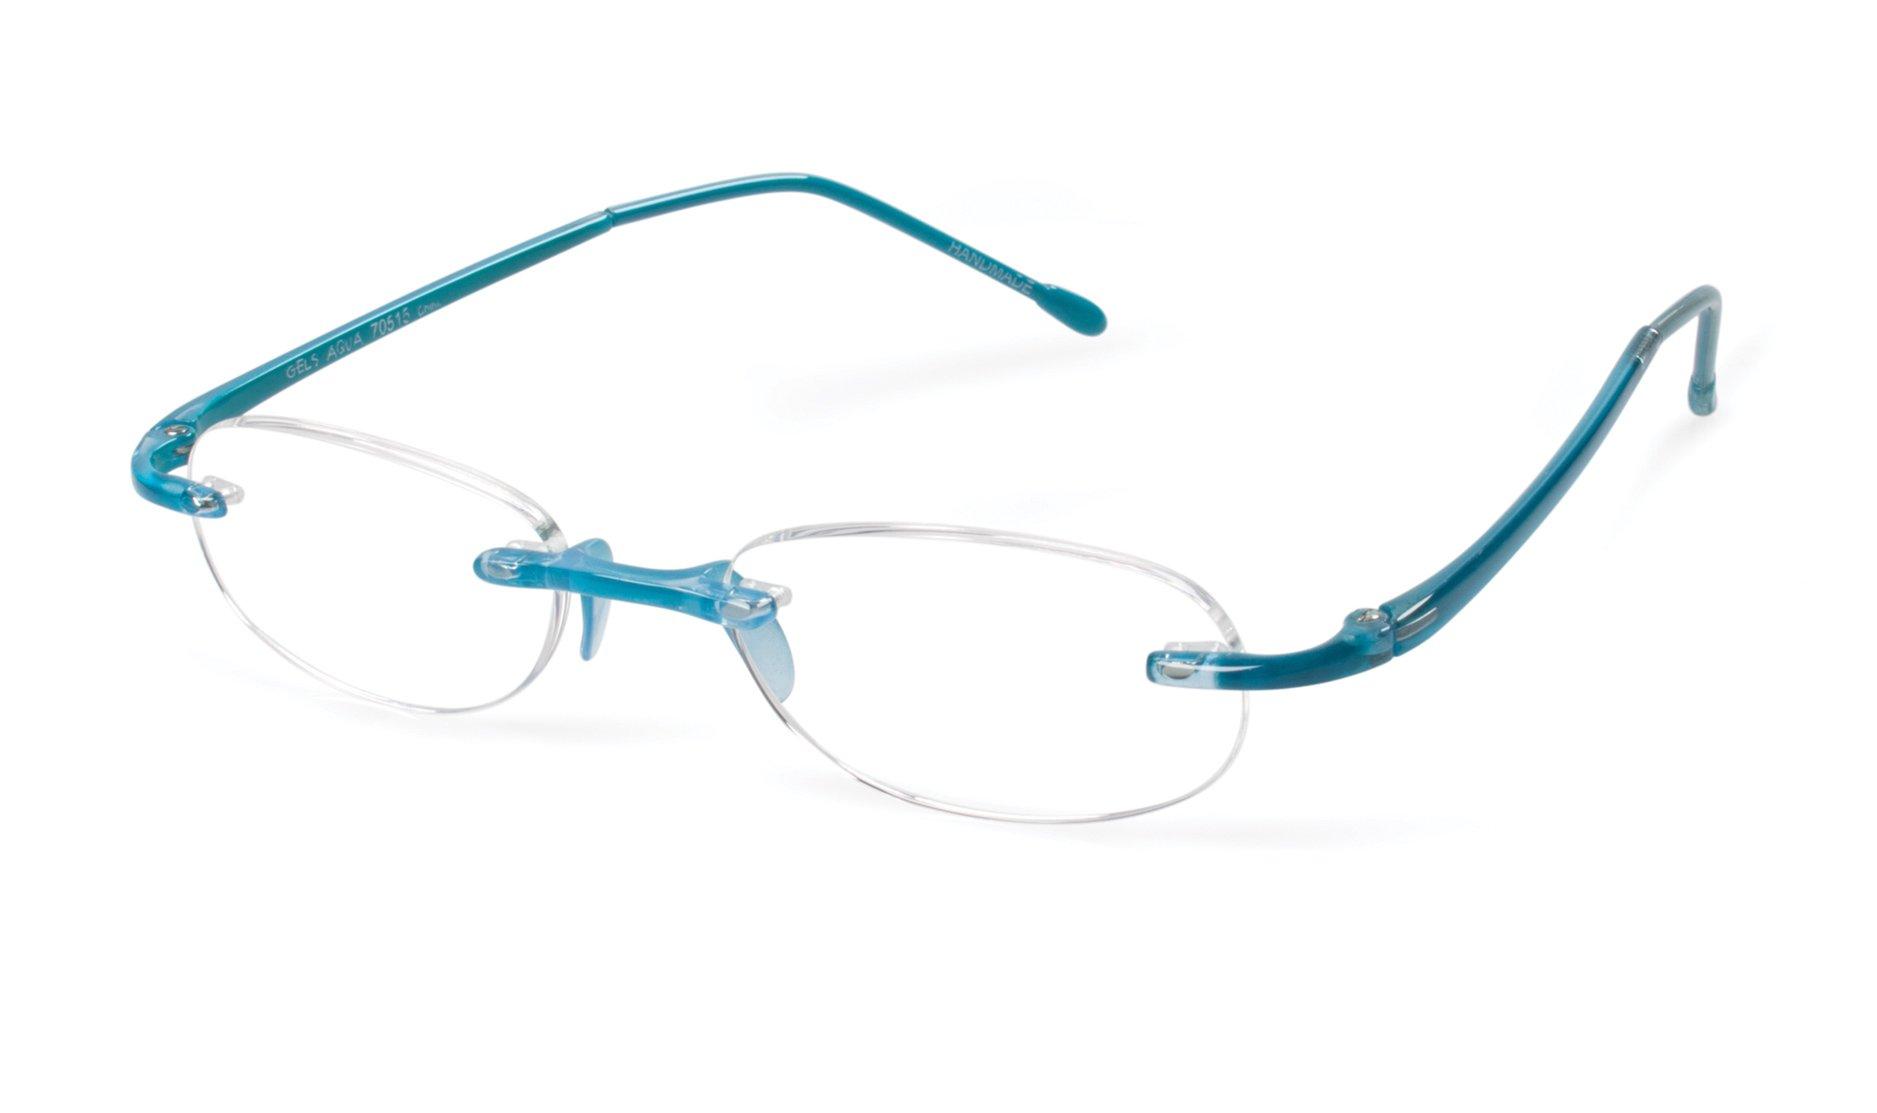 Gels - Reading Glasses From Scojo New York by Scojo New York